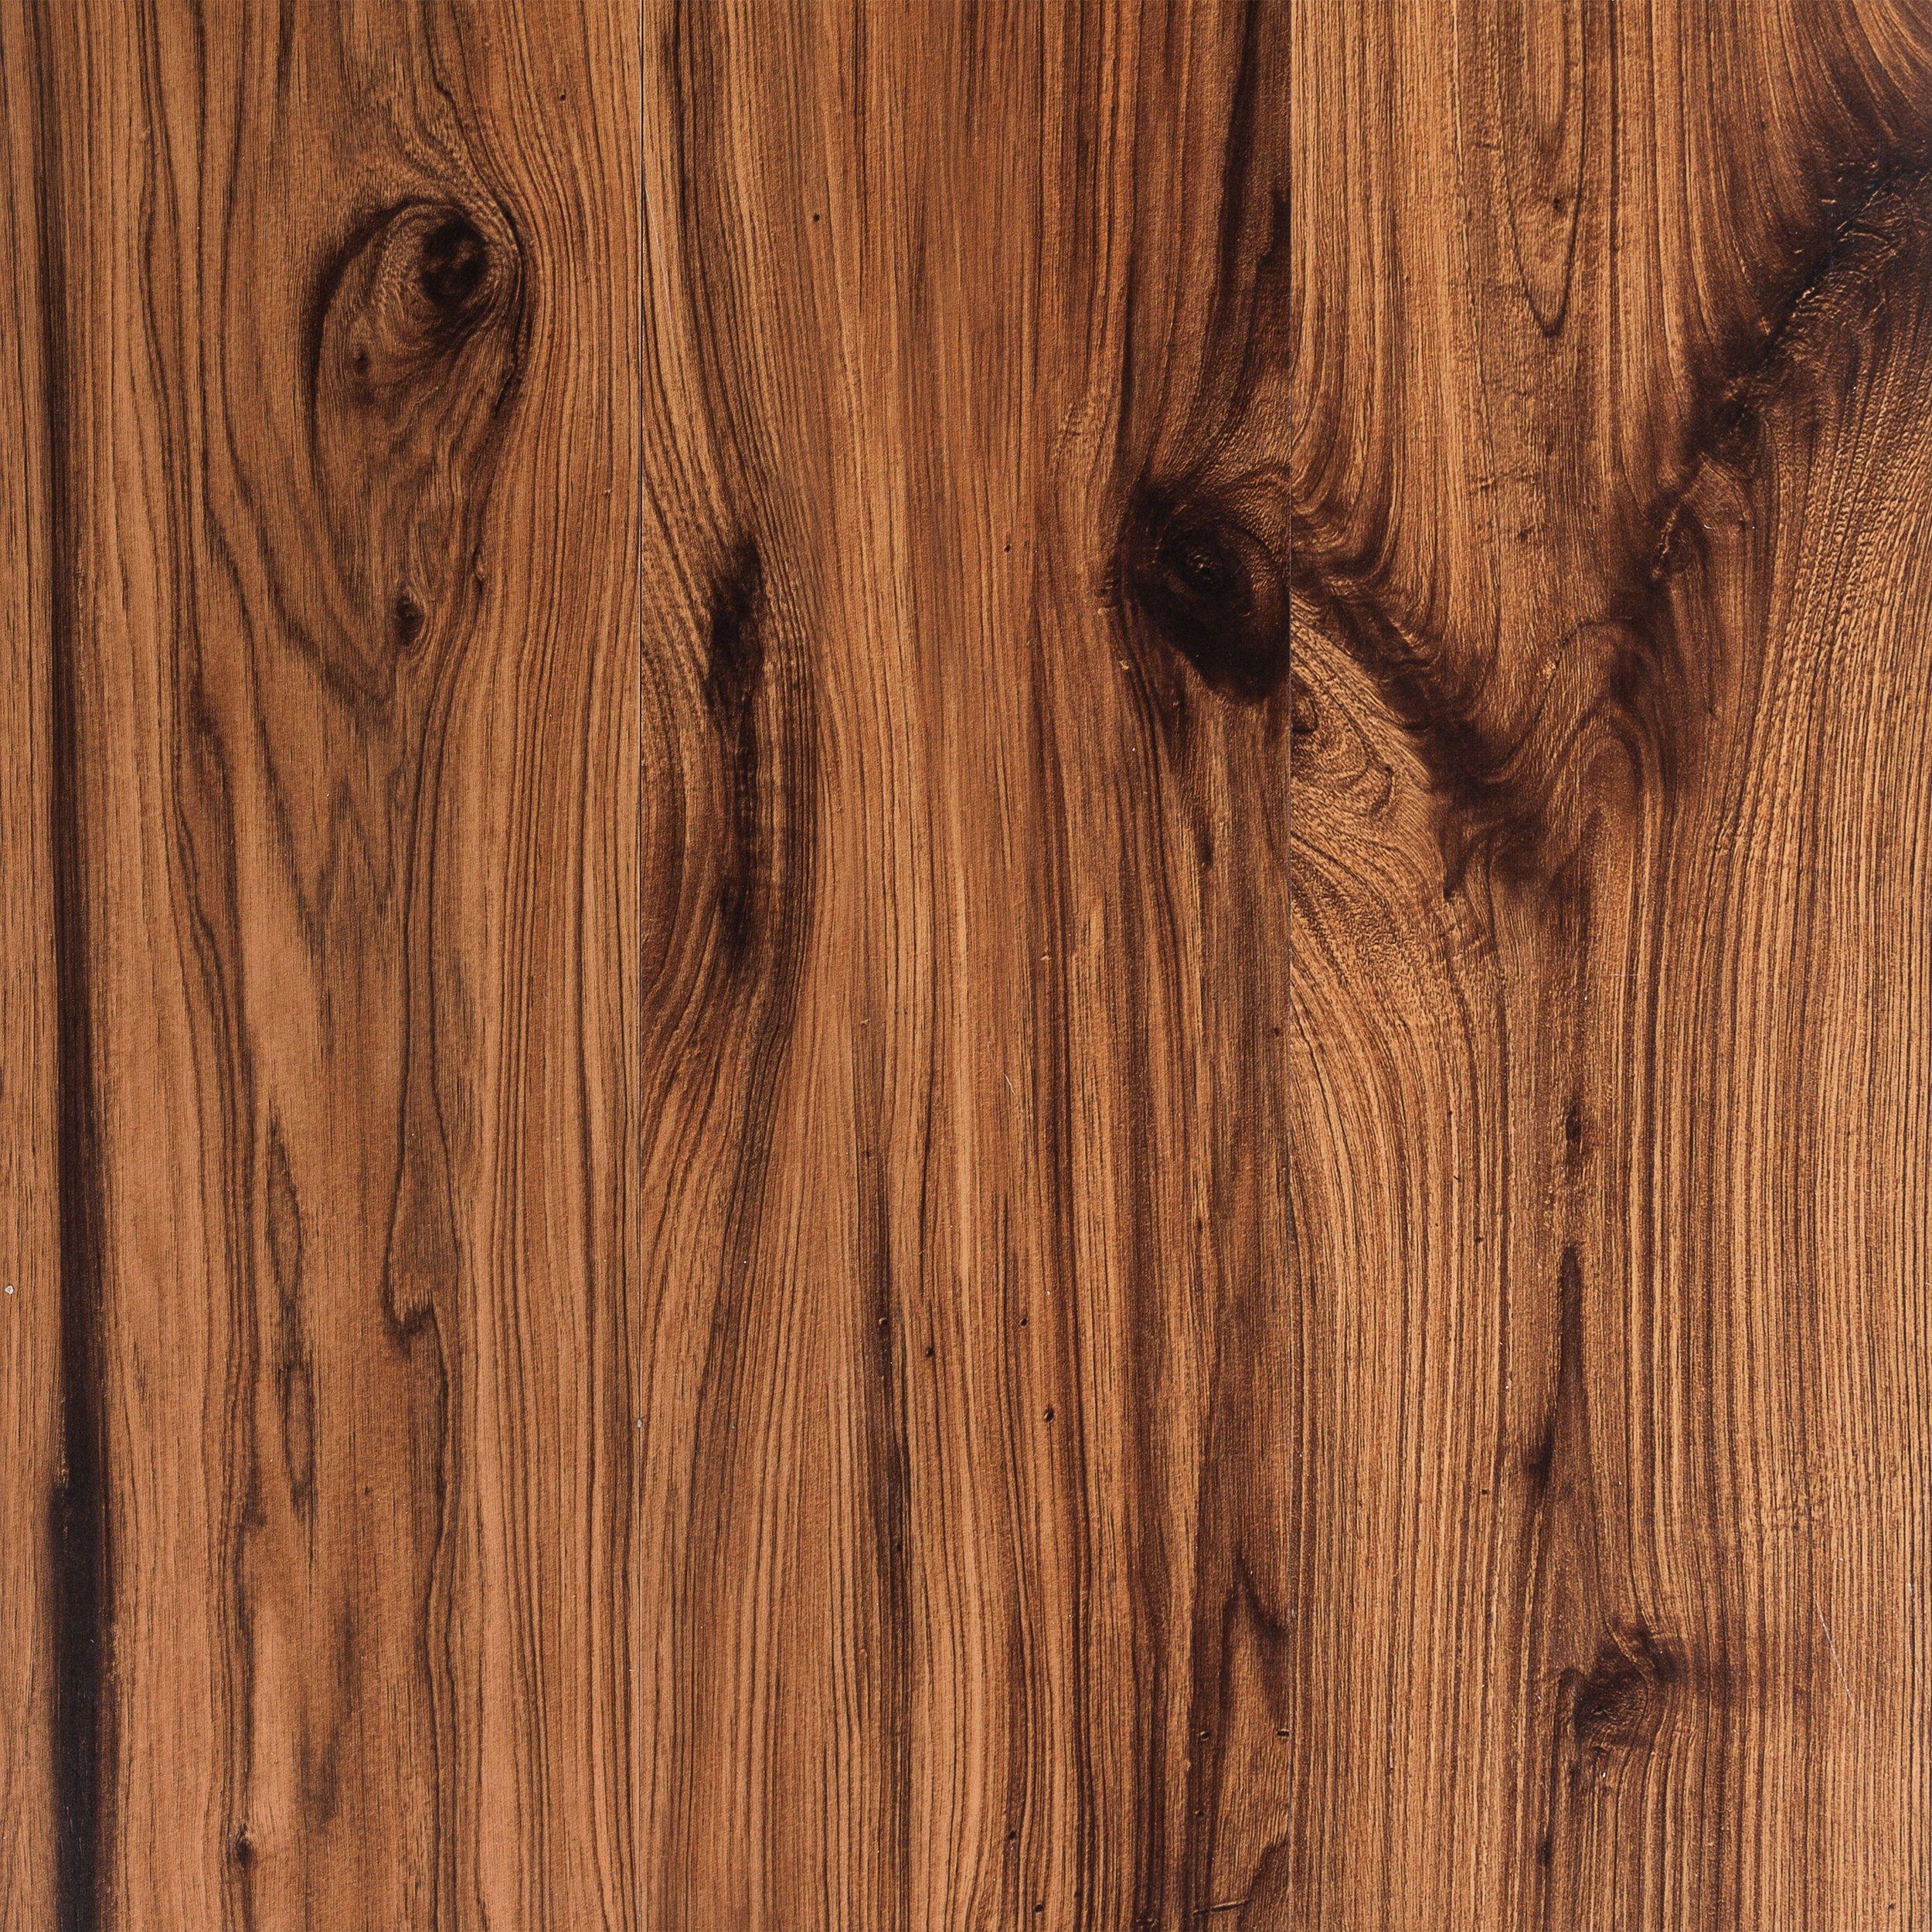 Canyon Chestnut Vinyl Plank 2mm 100130970 Floor and Decor